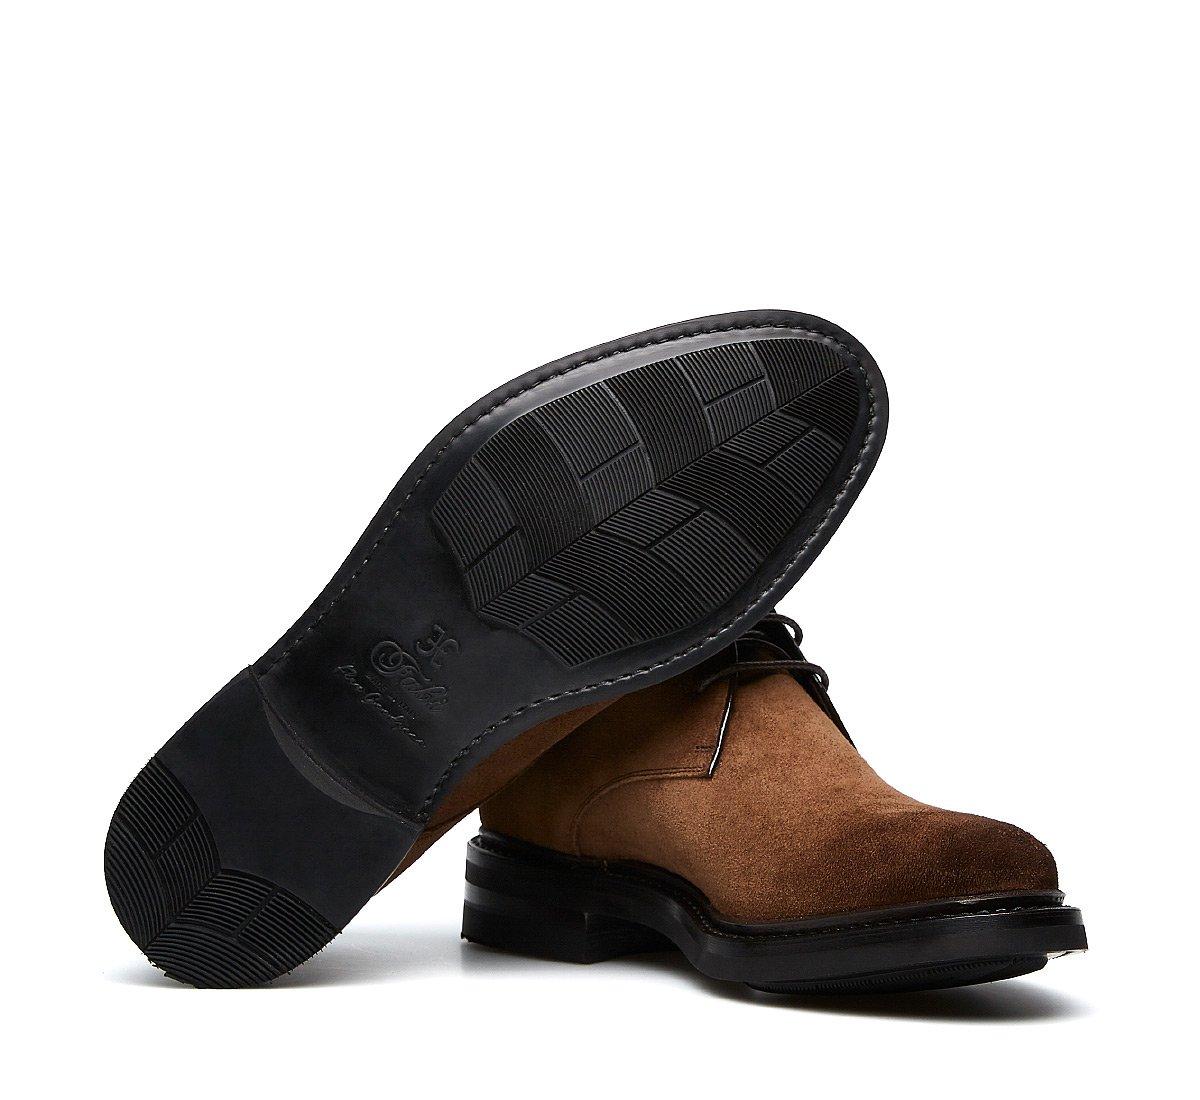 Fabi Flex Goodyear ankle boots in suede calfskin